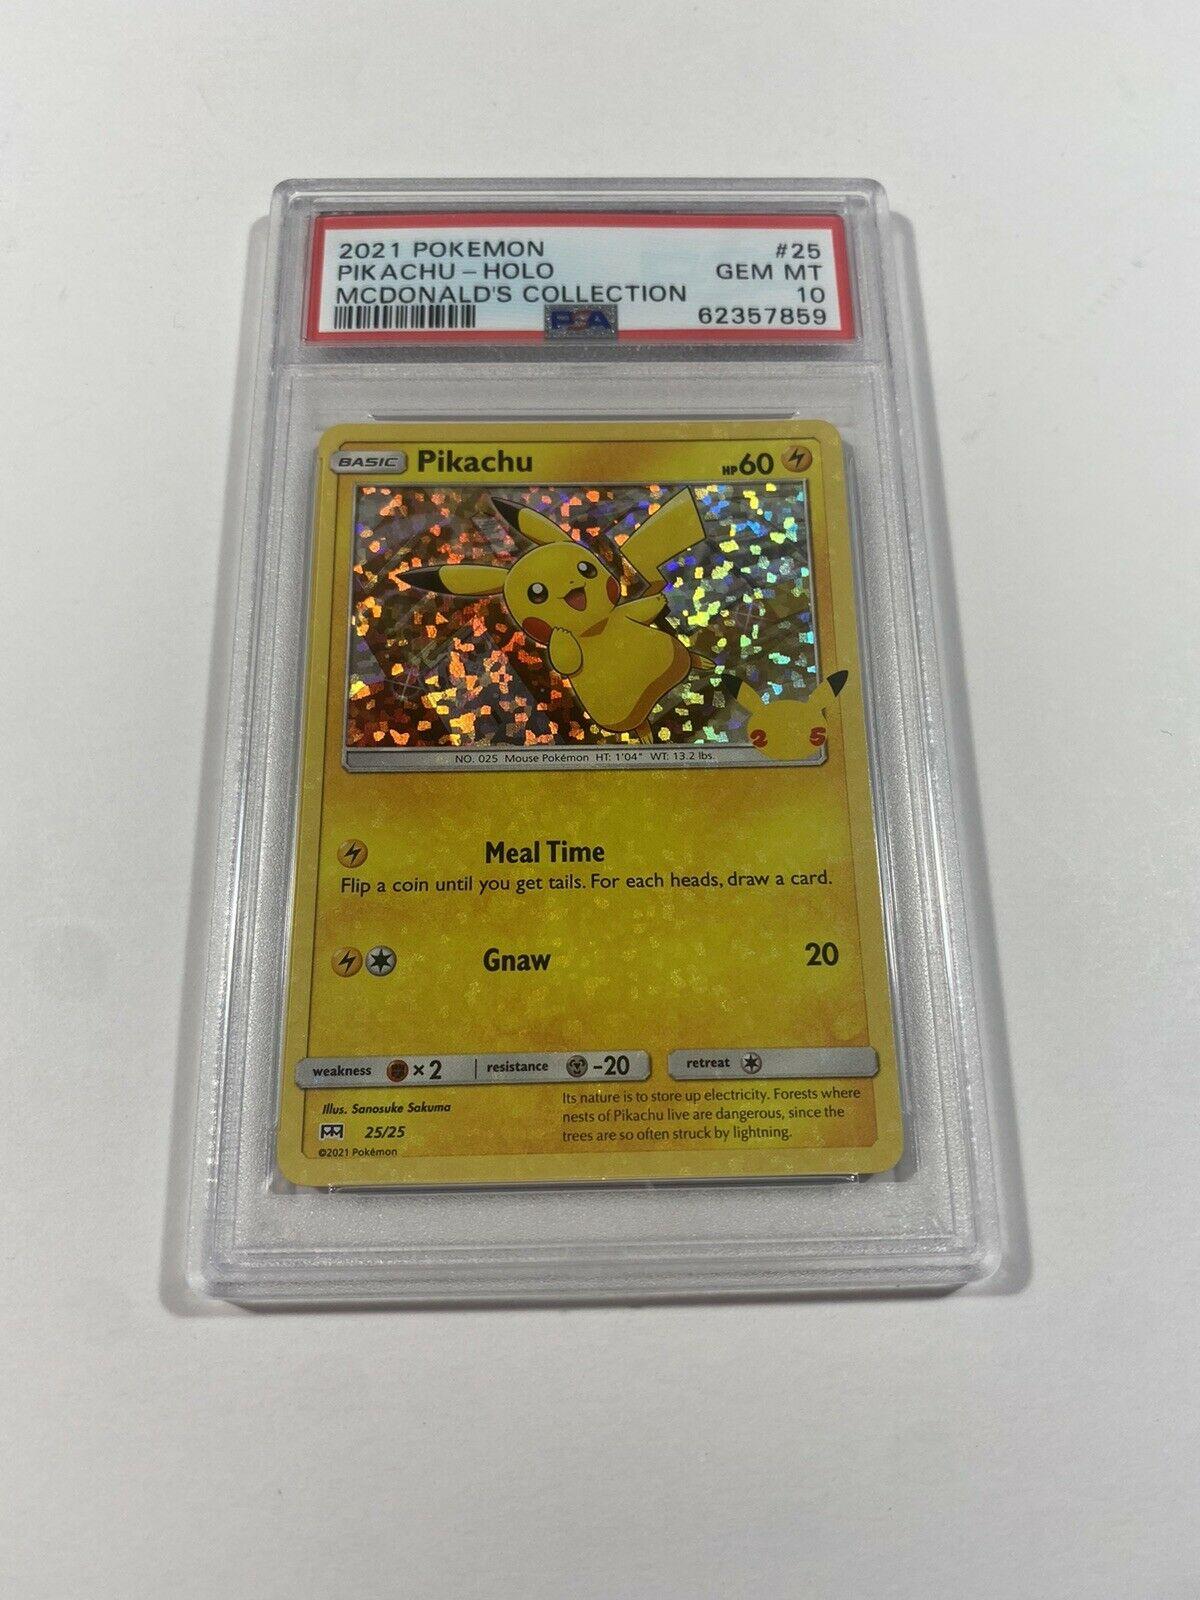 2021 Pokemon #25 Pikachu Holo McDonald's Collection PSA 10 GEM MINT